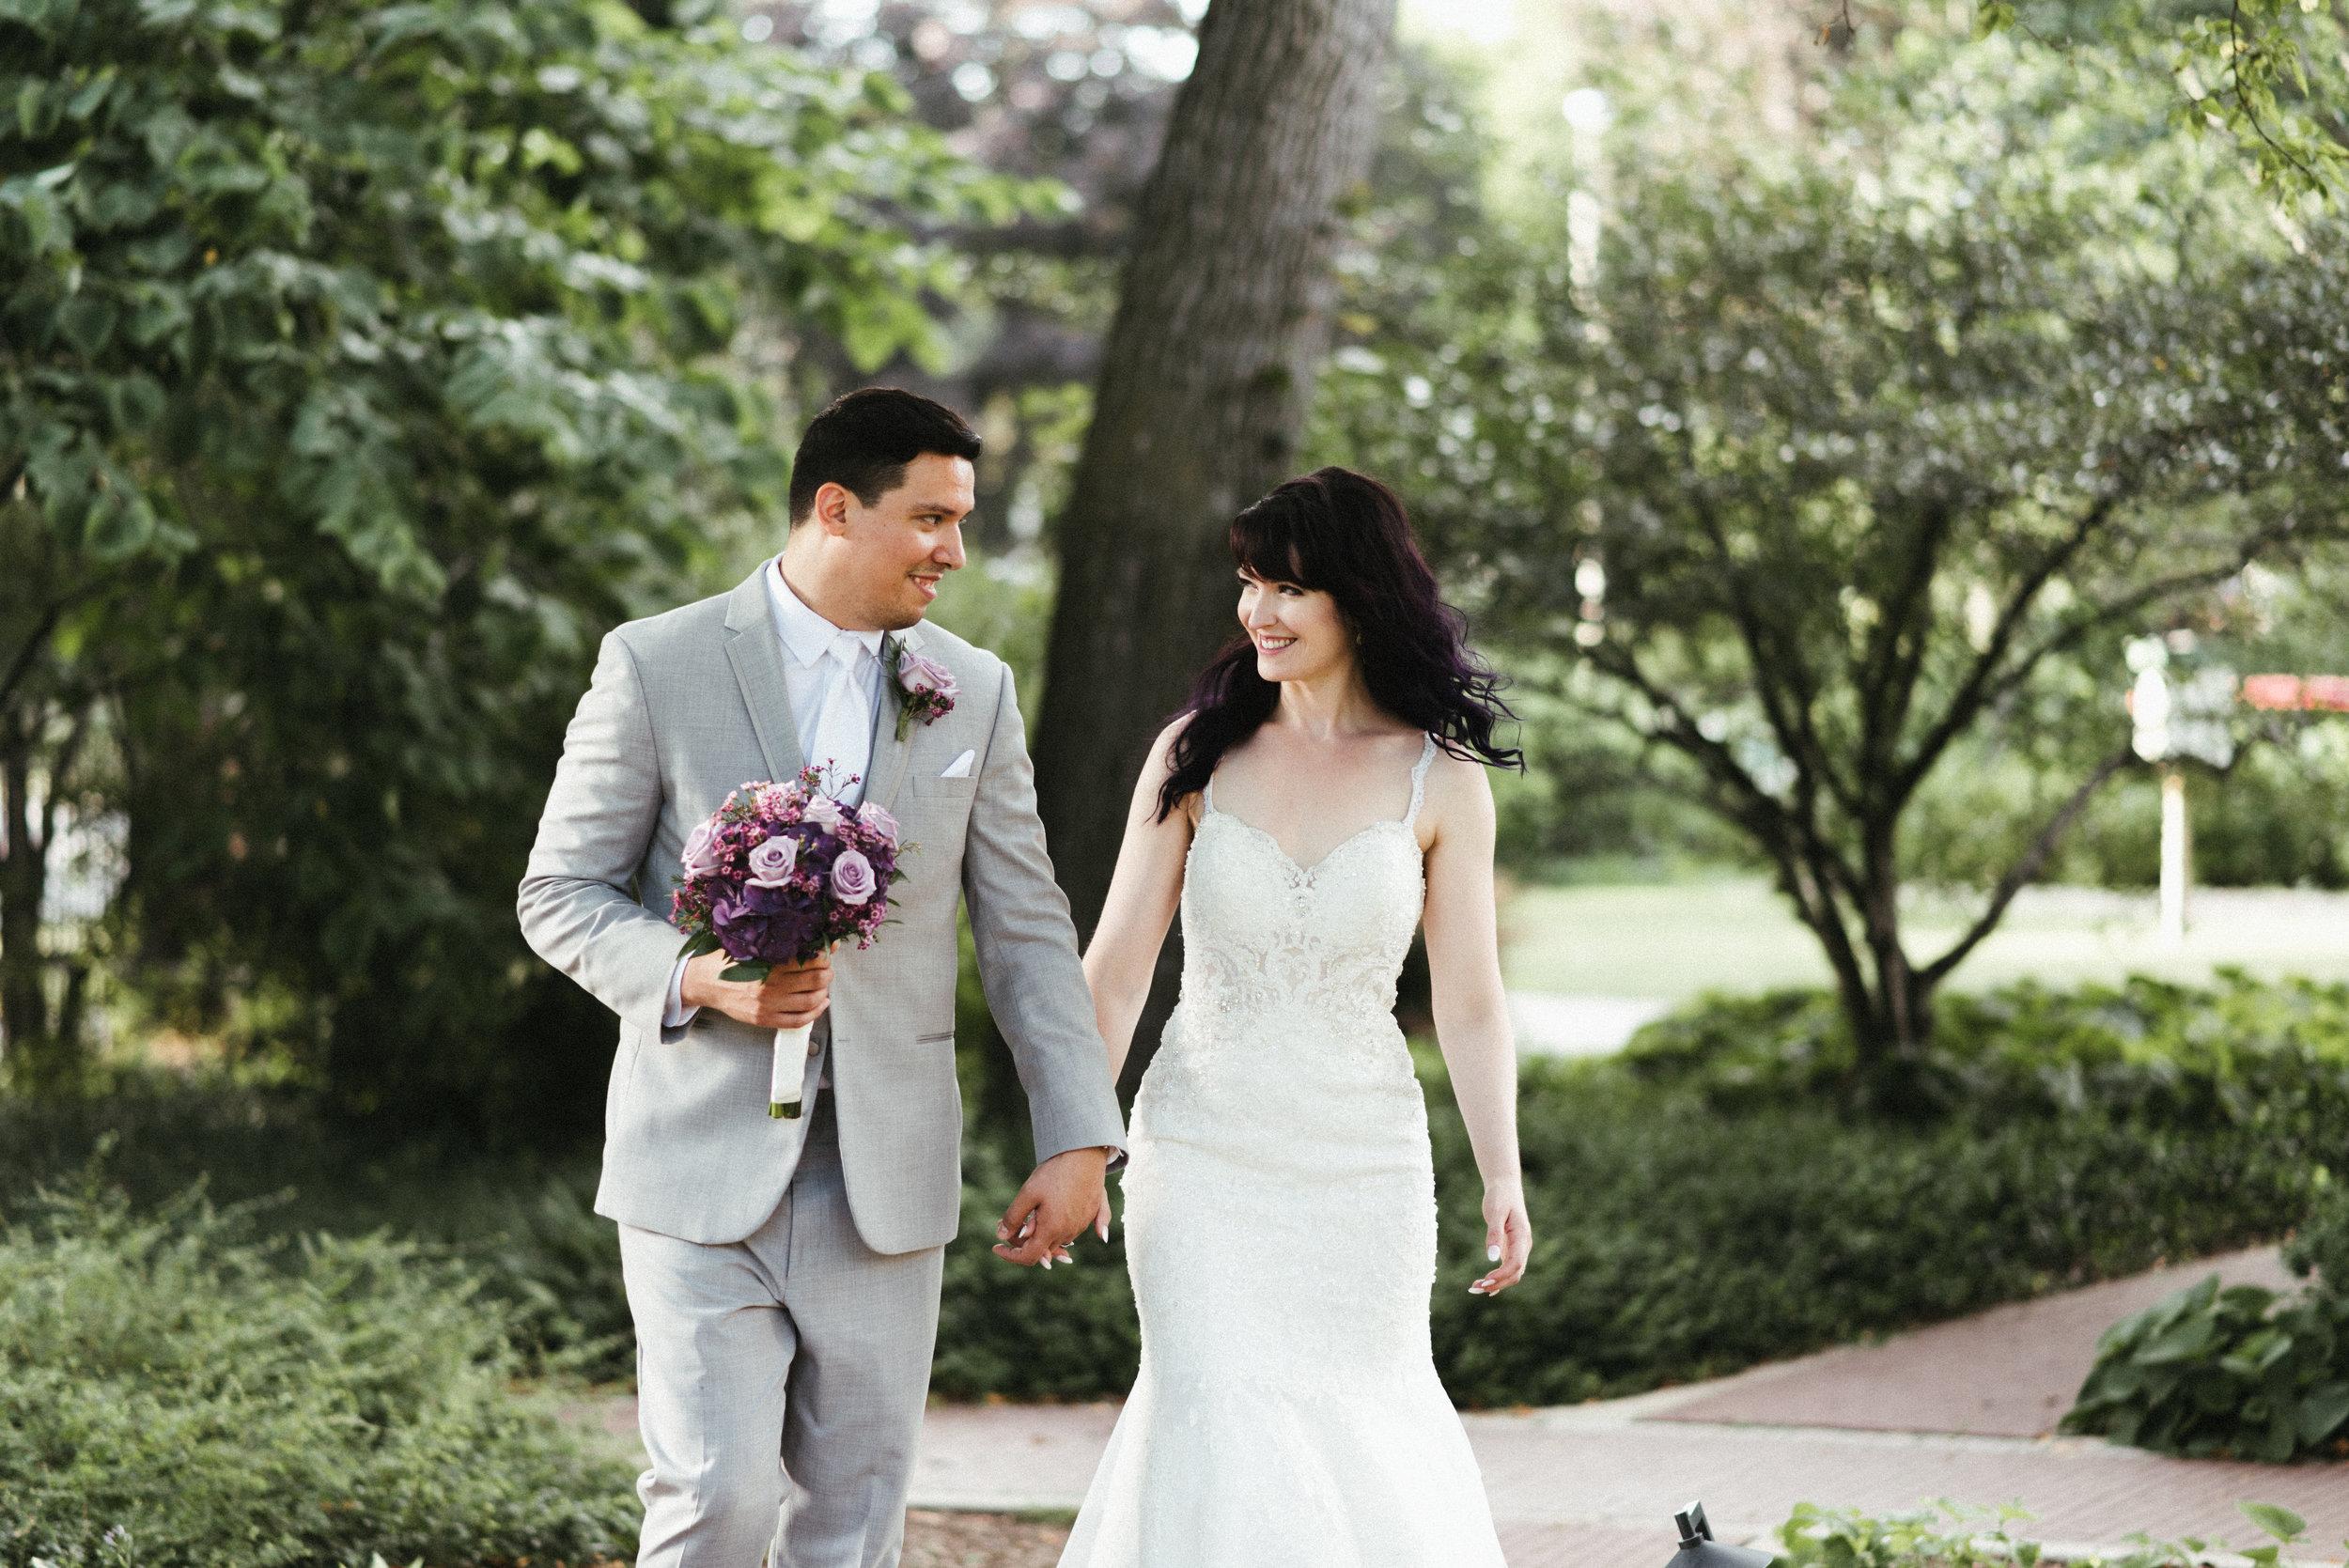 Sarah and Marcel - Romantic Vintage Wedding At Cheney Mansion | Oak Park, IL | Chicago Wedding Photographer